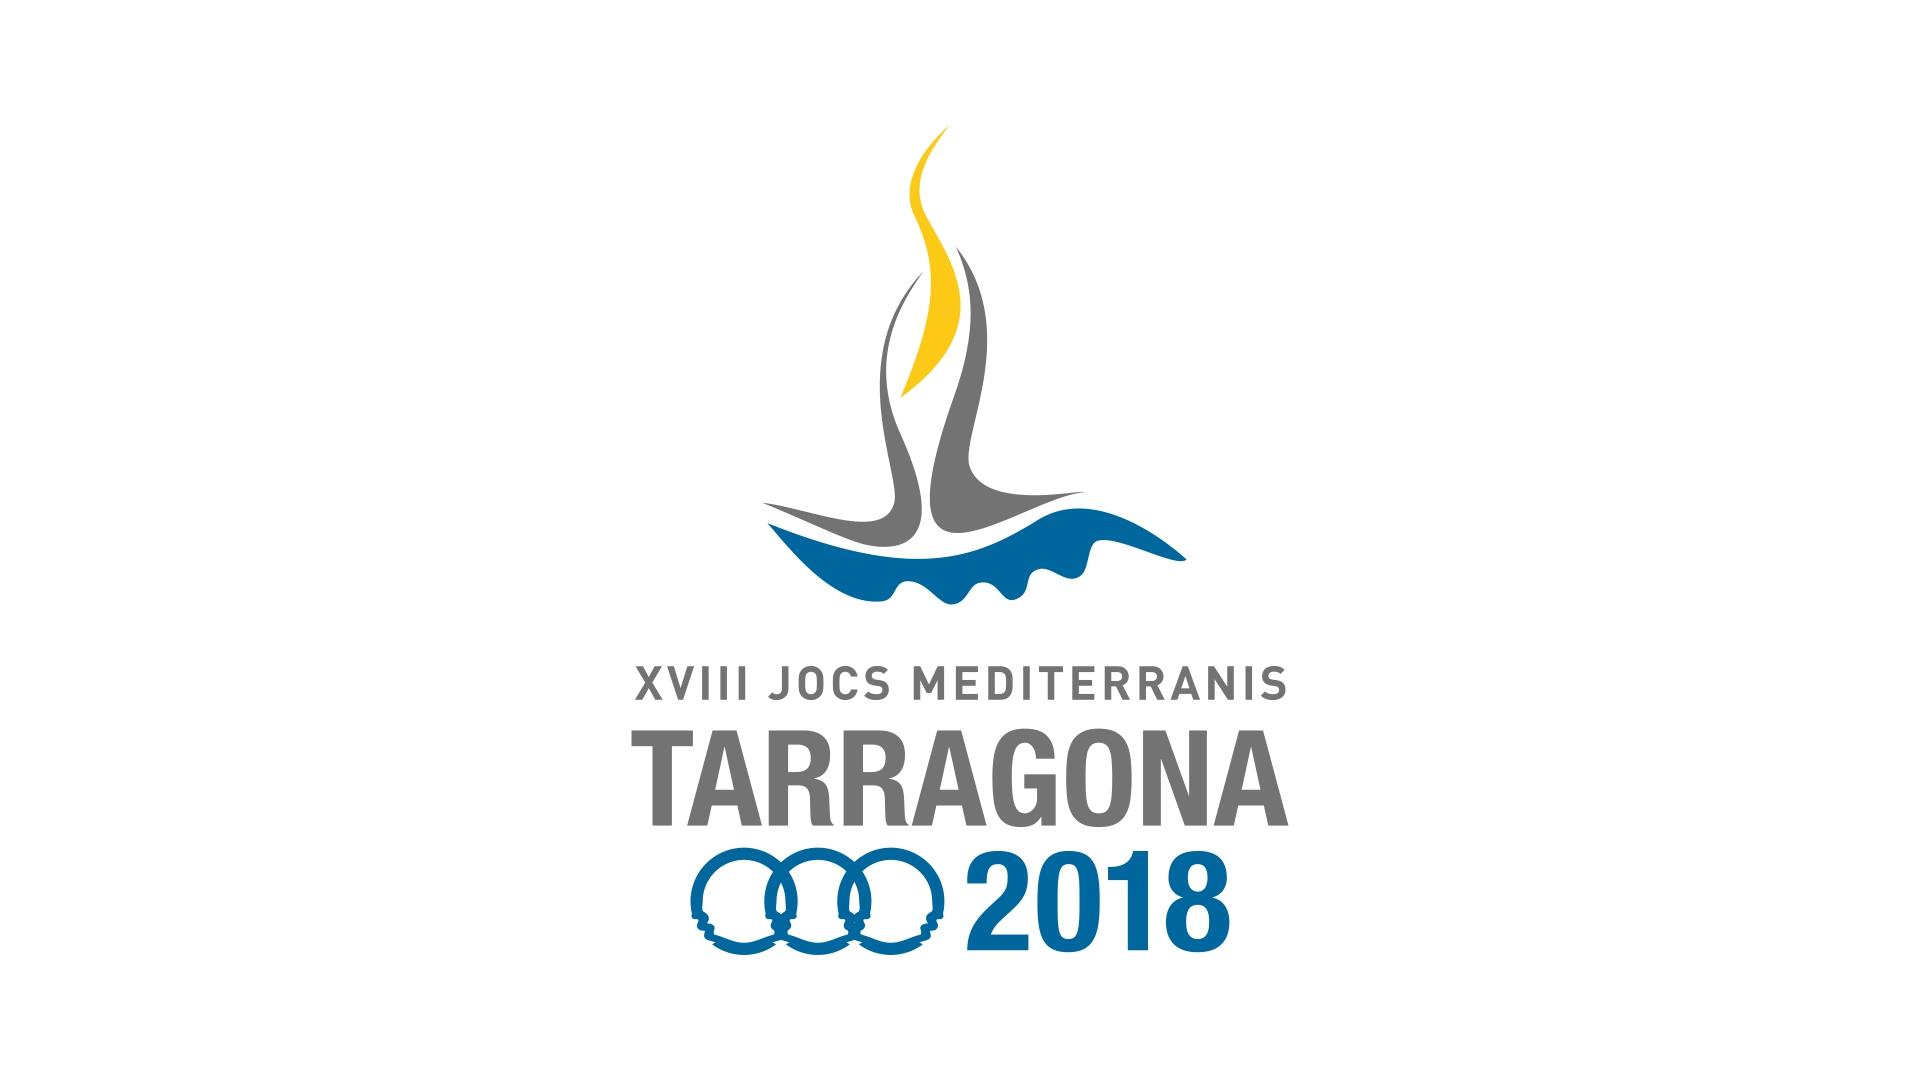 logo tarragona 2018 Kico Uribe Evolutt Studio